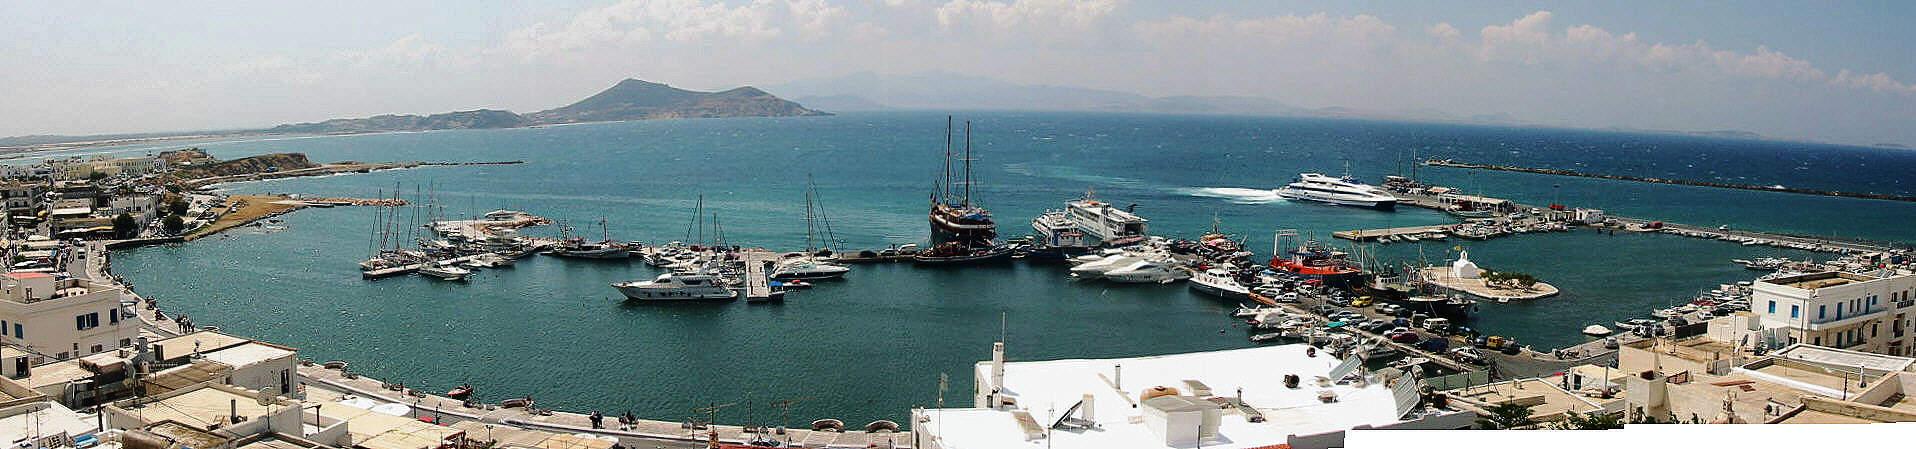 Naxos Marina Port Harbour Naxos Greece Cyclades yachting